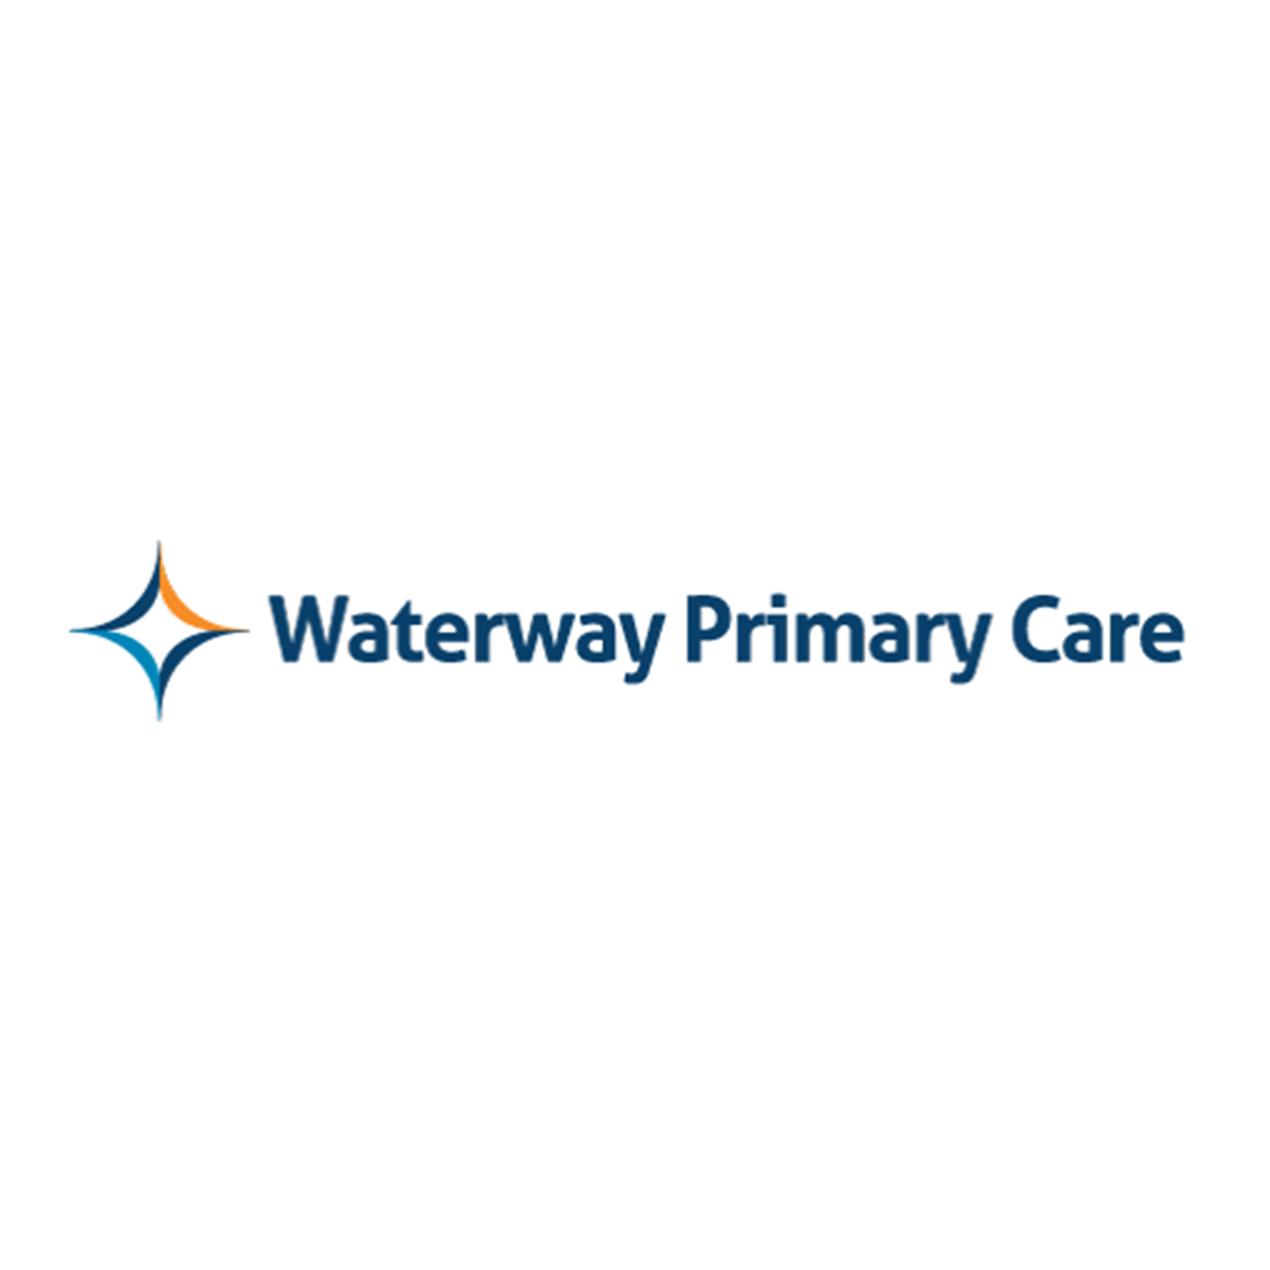 Waterway Primary Care